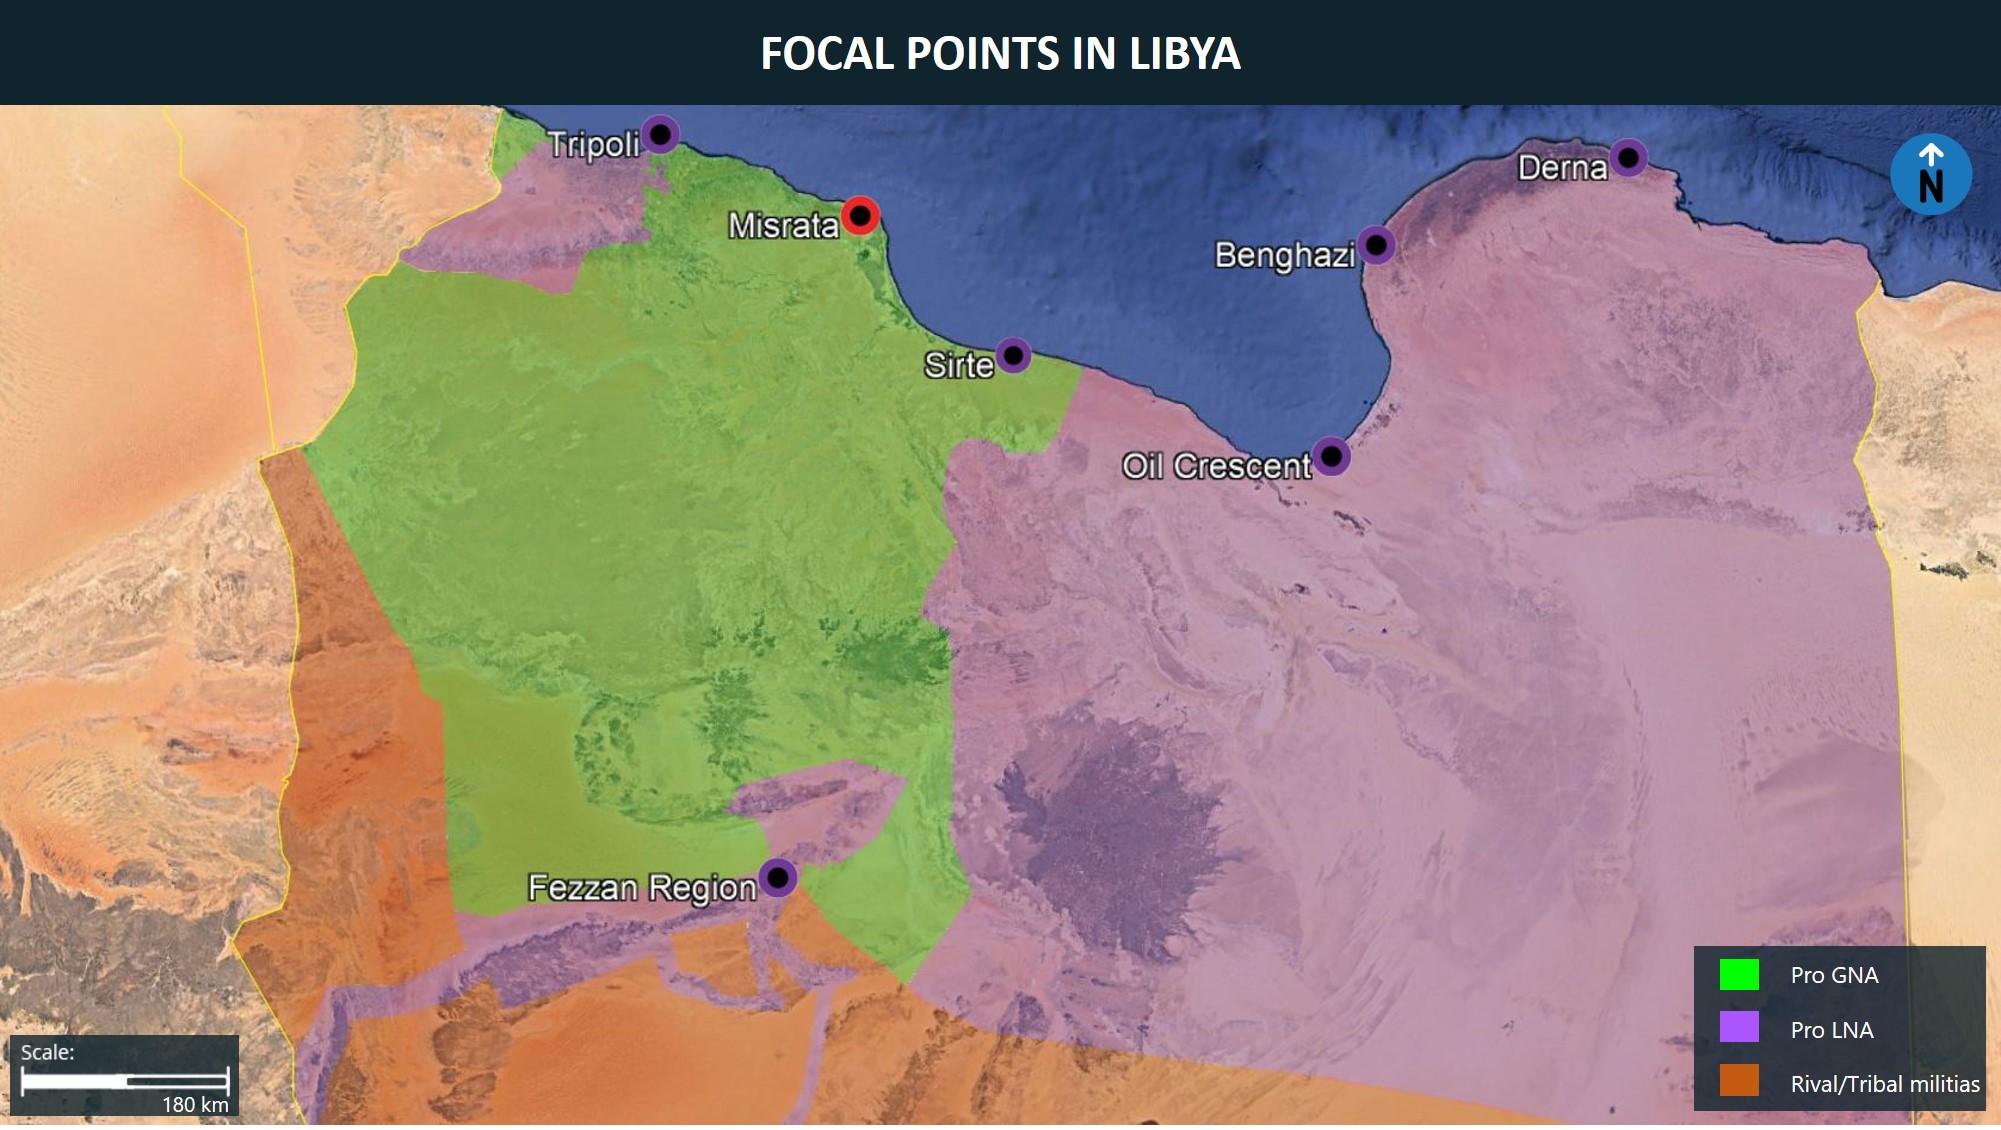 Focal Points in Libya